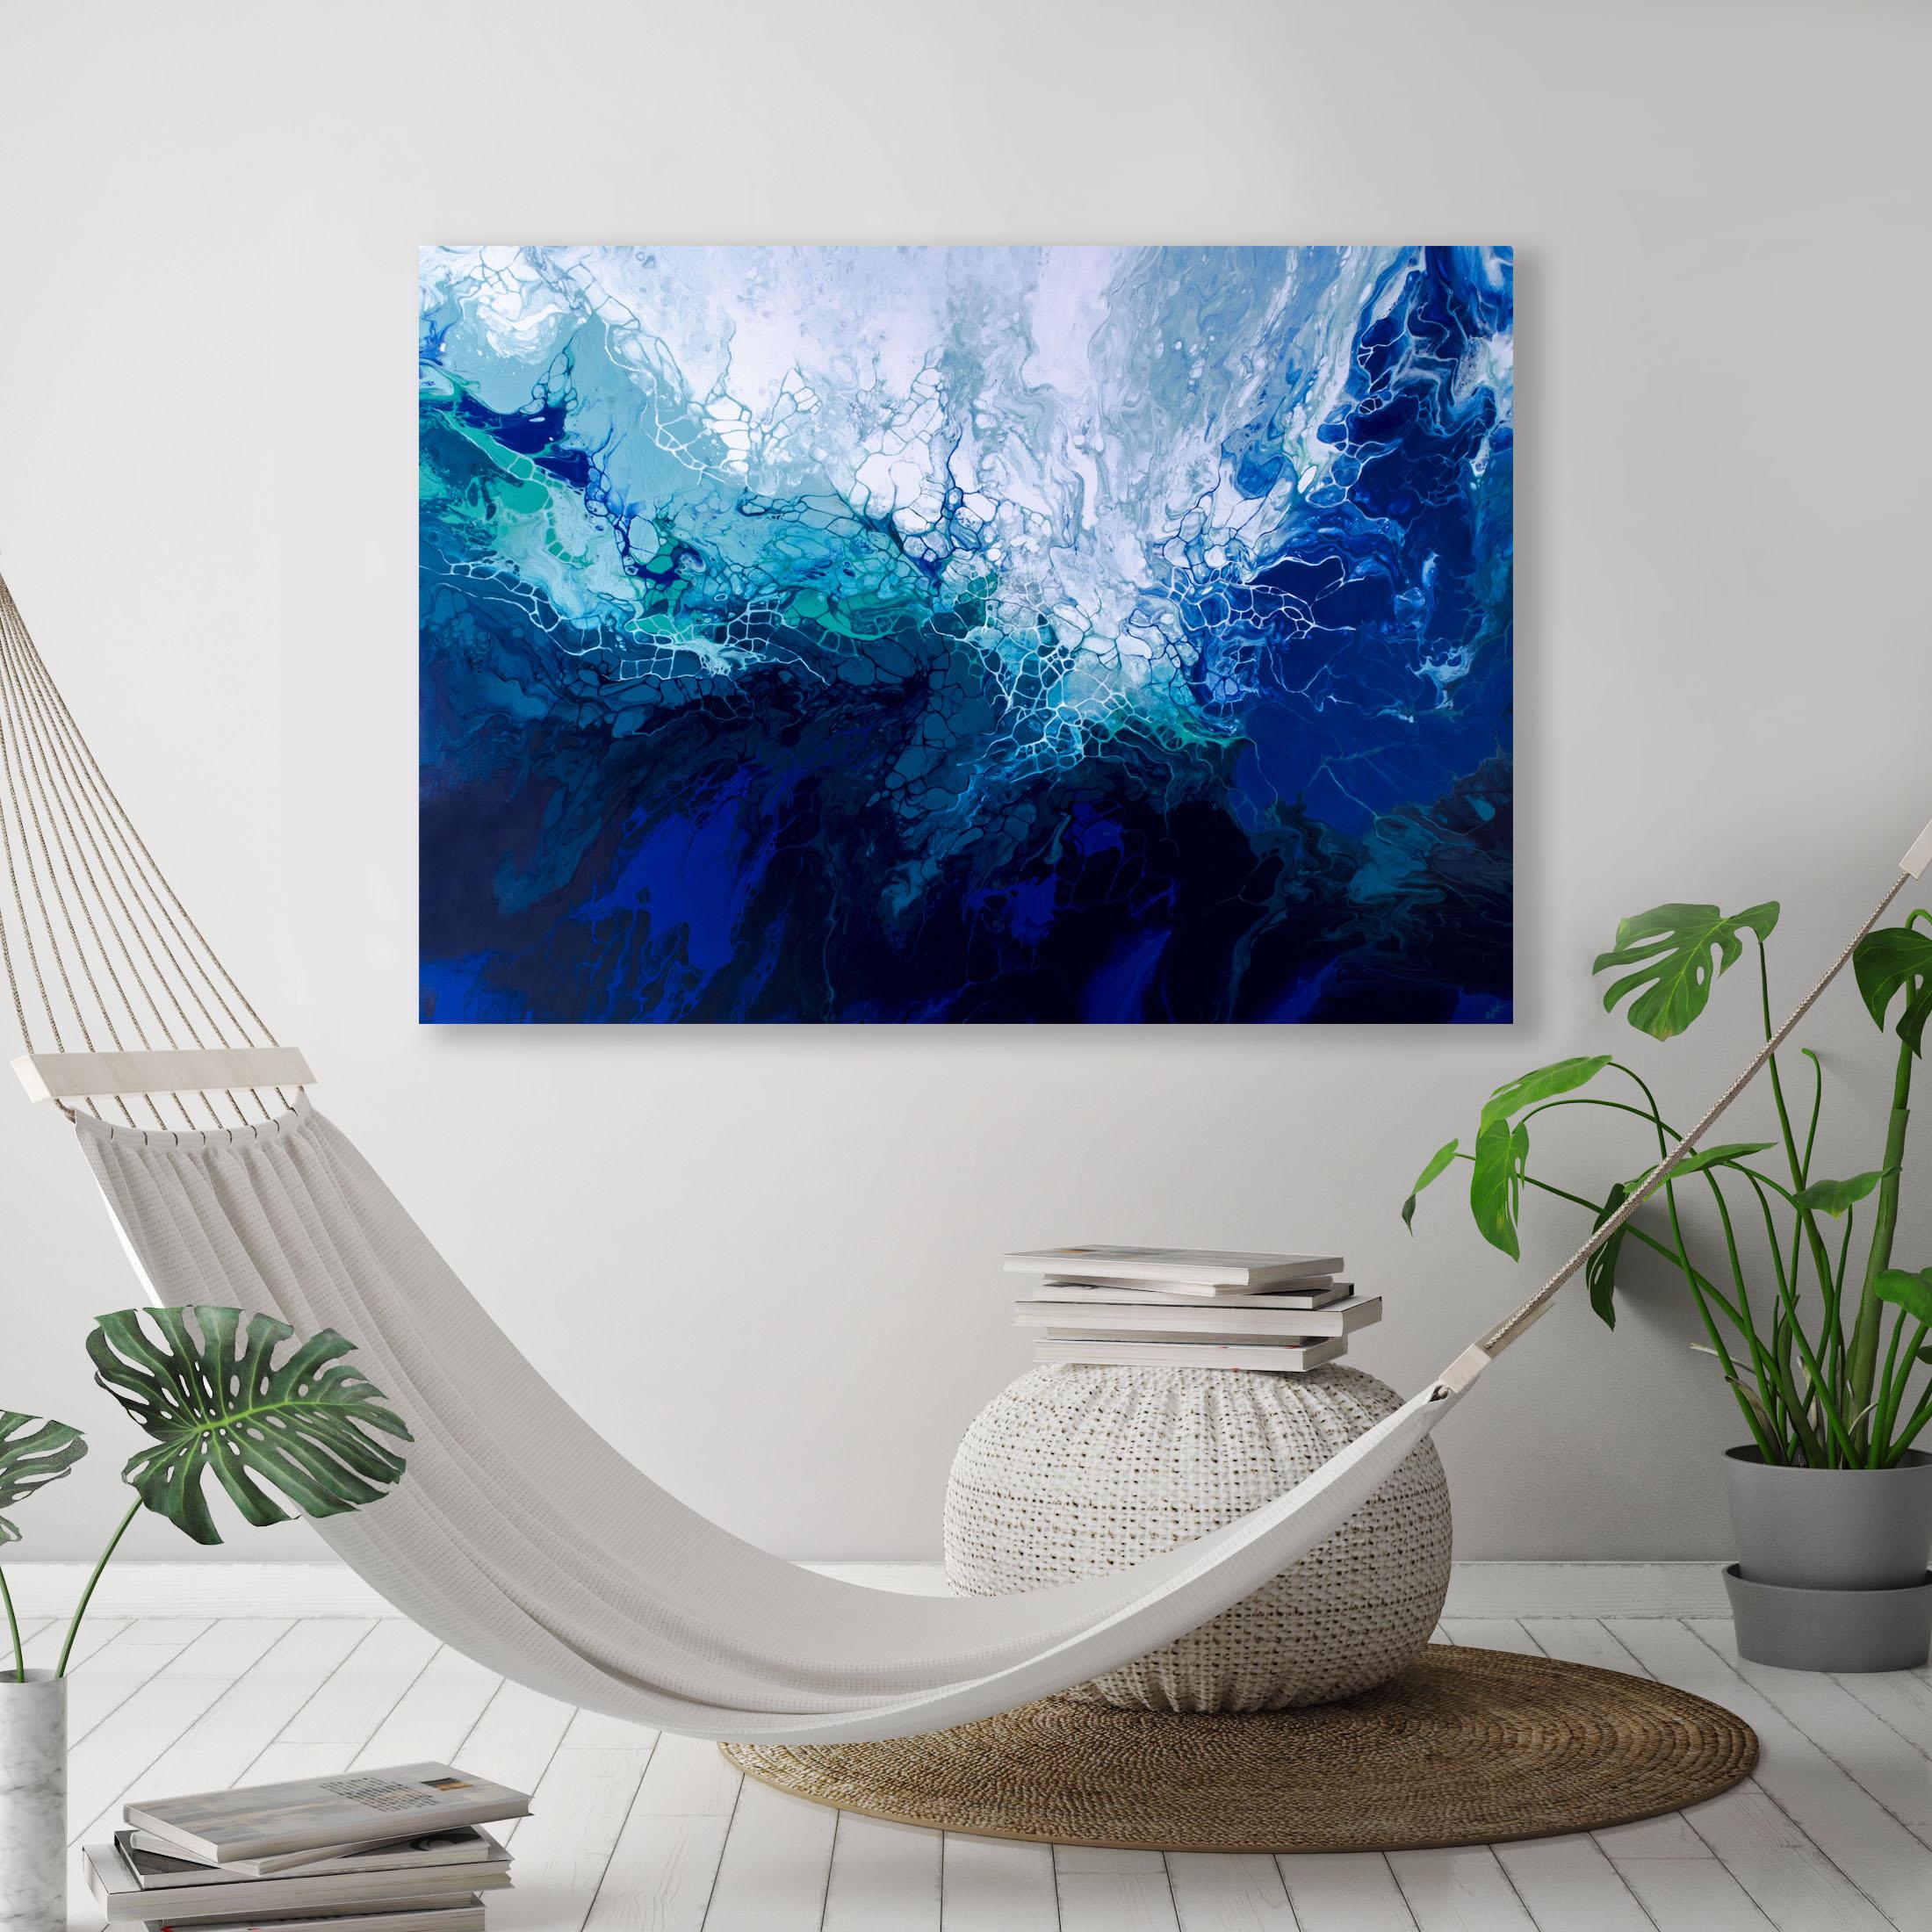 MAWU/ 2018/Fluid Acrylic and Atlantic Ocean Water / 36x48x1.25/ For Sale/    CONTACT BoJu Art